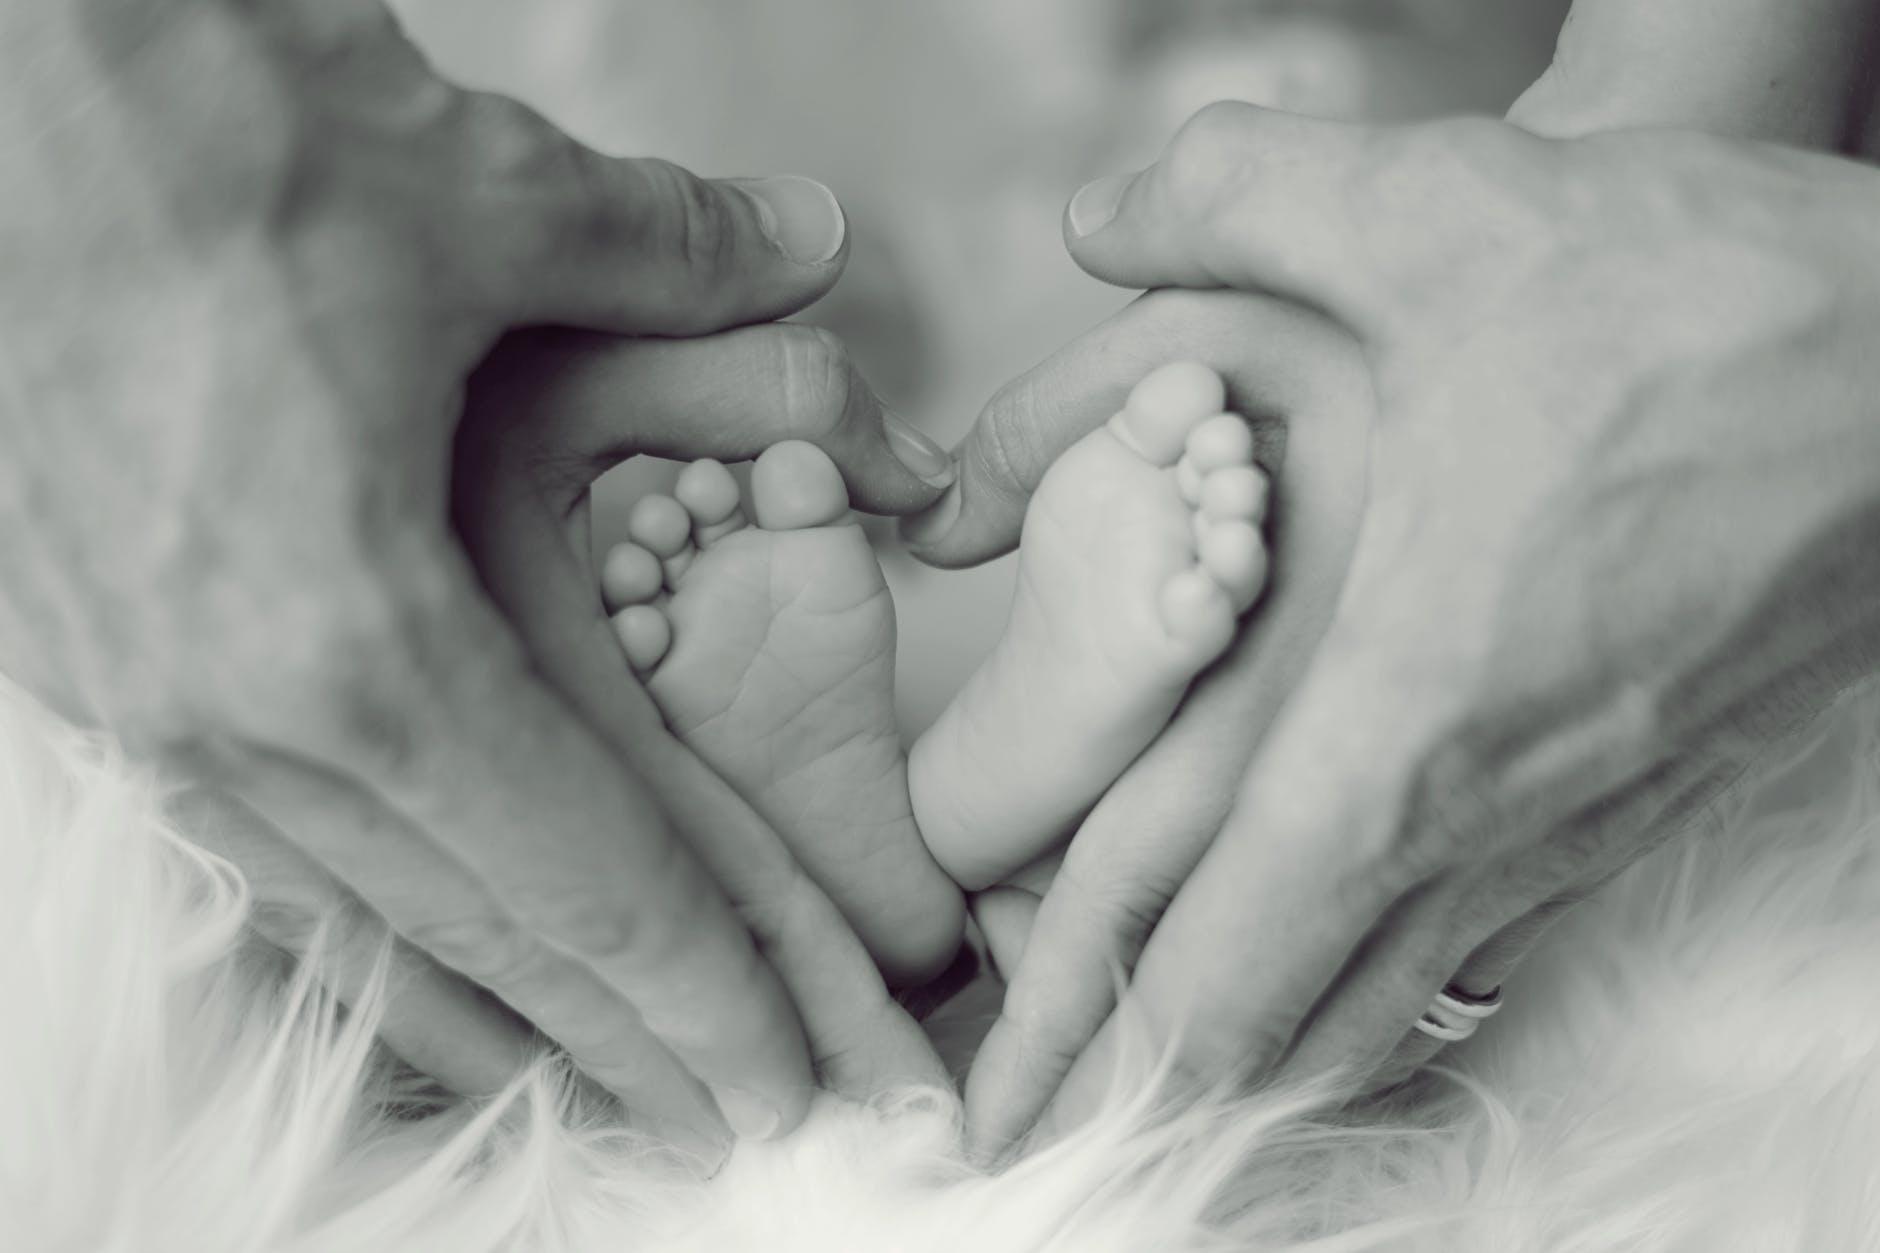 transcendent birth doula care houston texas